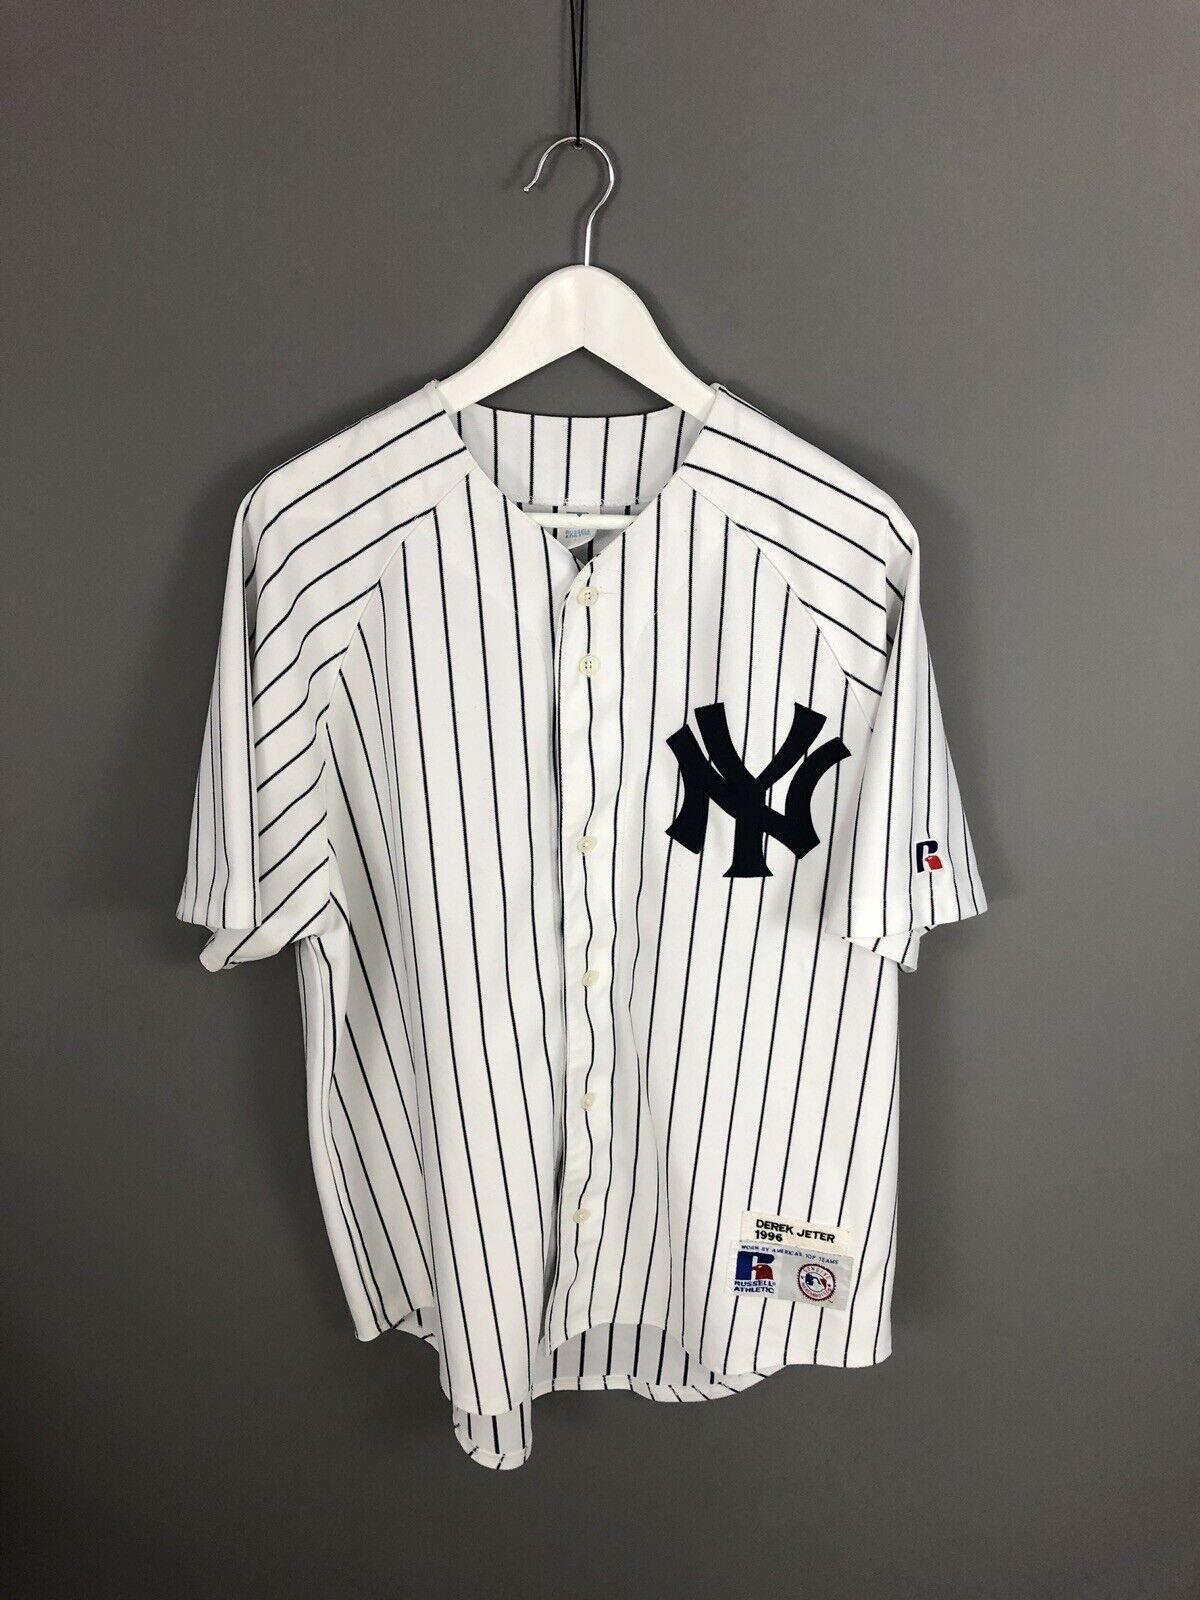 NEW YORK YANKEES Baseball Jersey - Large - 2 JETER - Russell Athletic - Men's